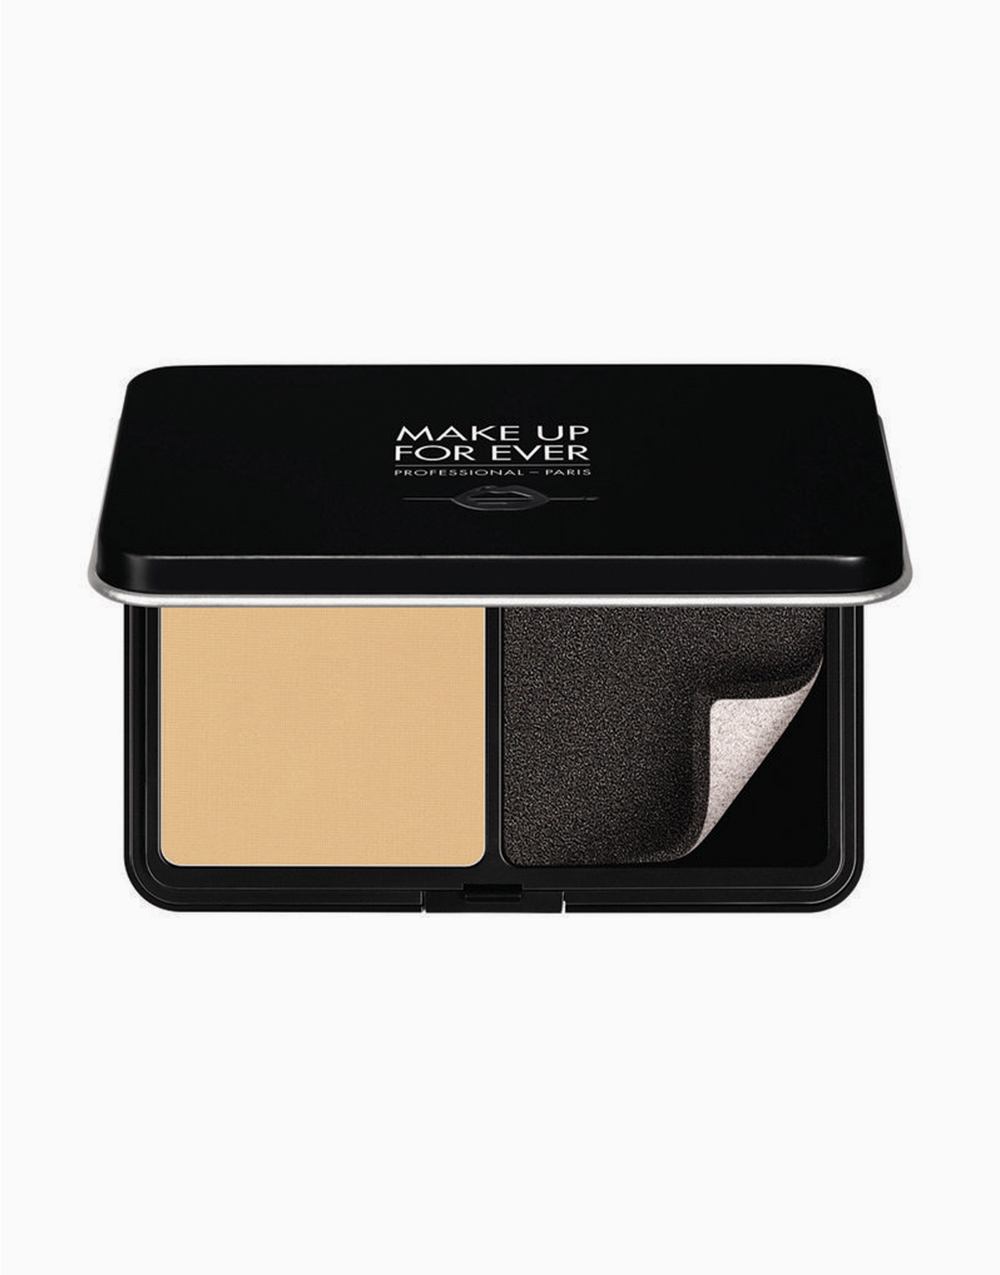 Matte Velvet Skin Compact (11g) by Make Up For Ever | Y225